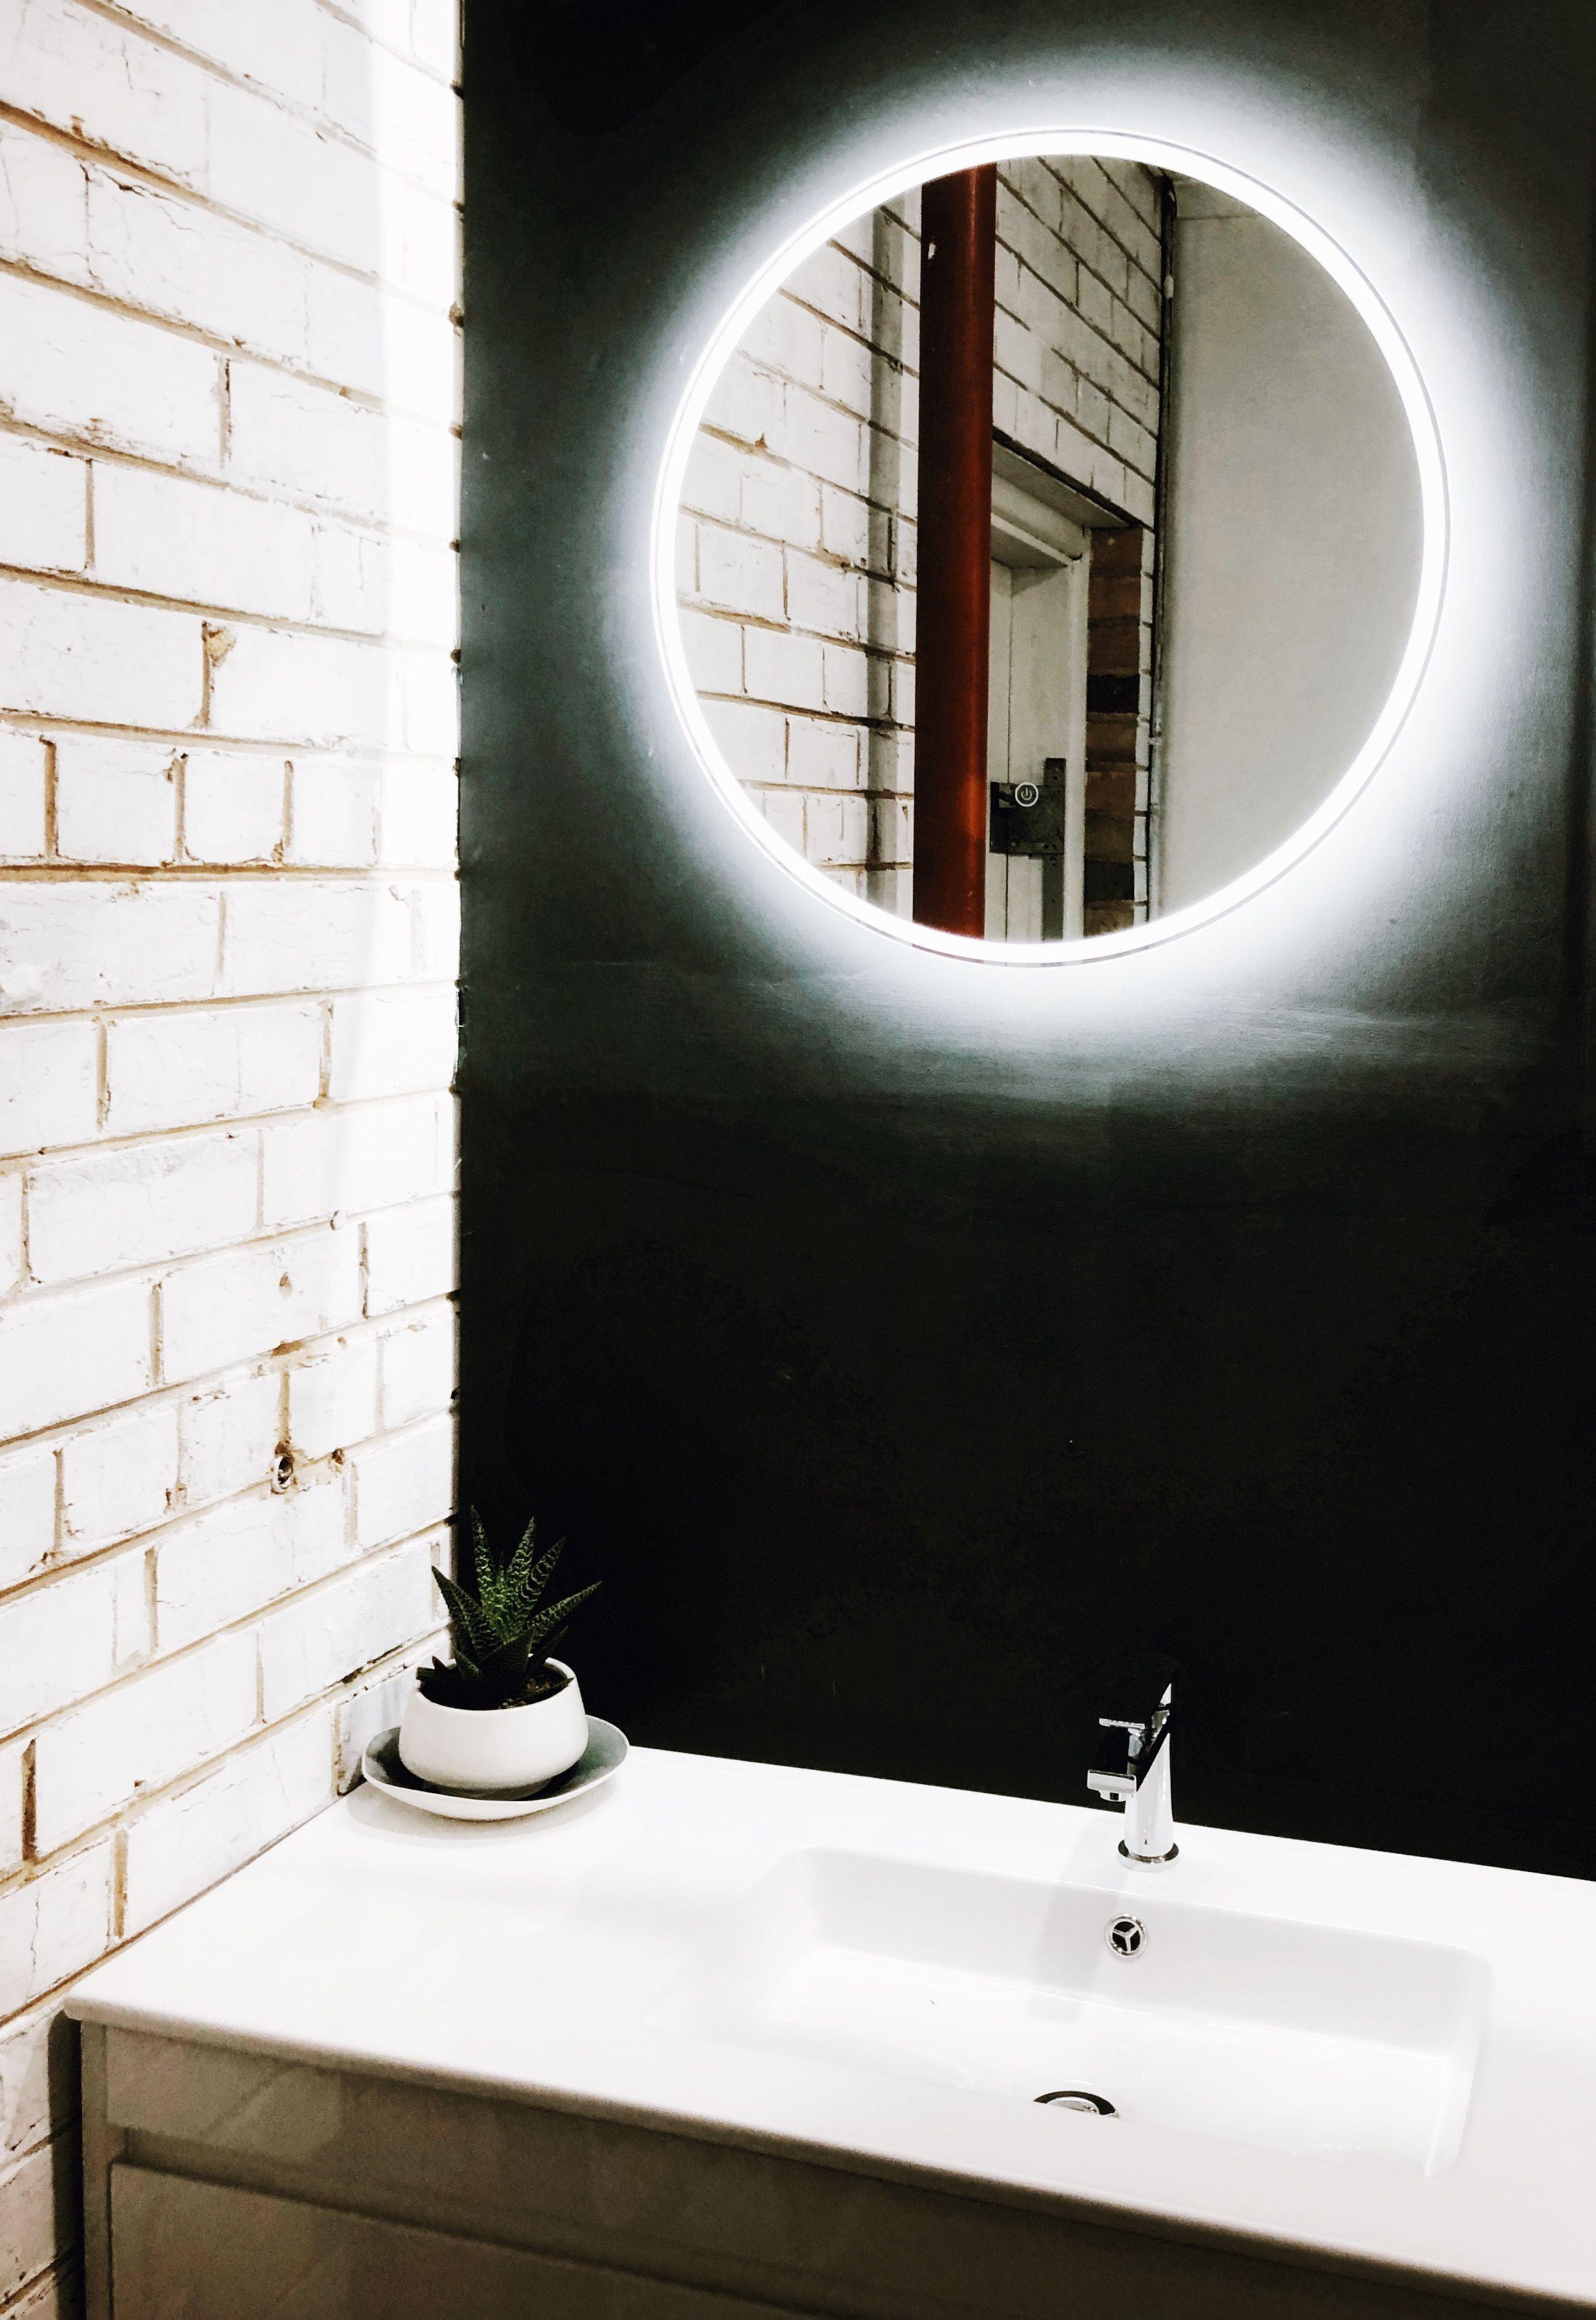 Backlit Mirror Remer Round A Mirror Circle Mirror Sphere Mirror Led Mirror Demister P Backlit Bathroom Mirror Bathroom Accessories Design Bathroom Mirror